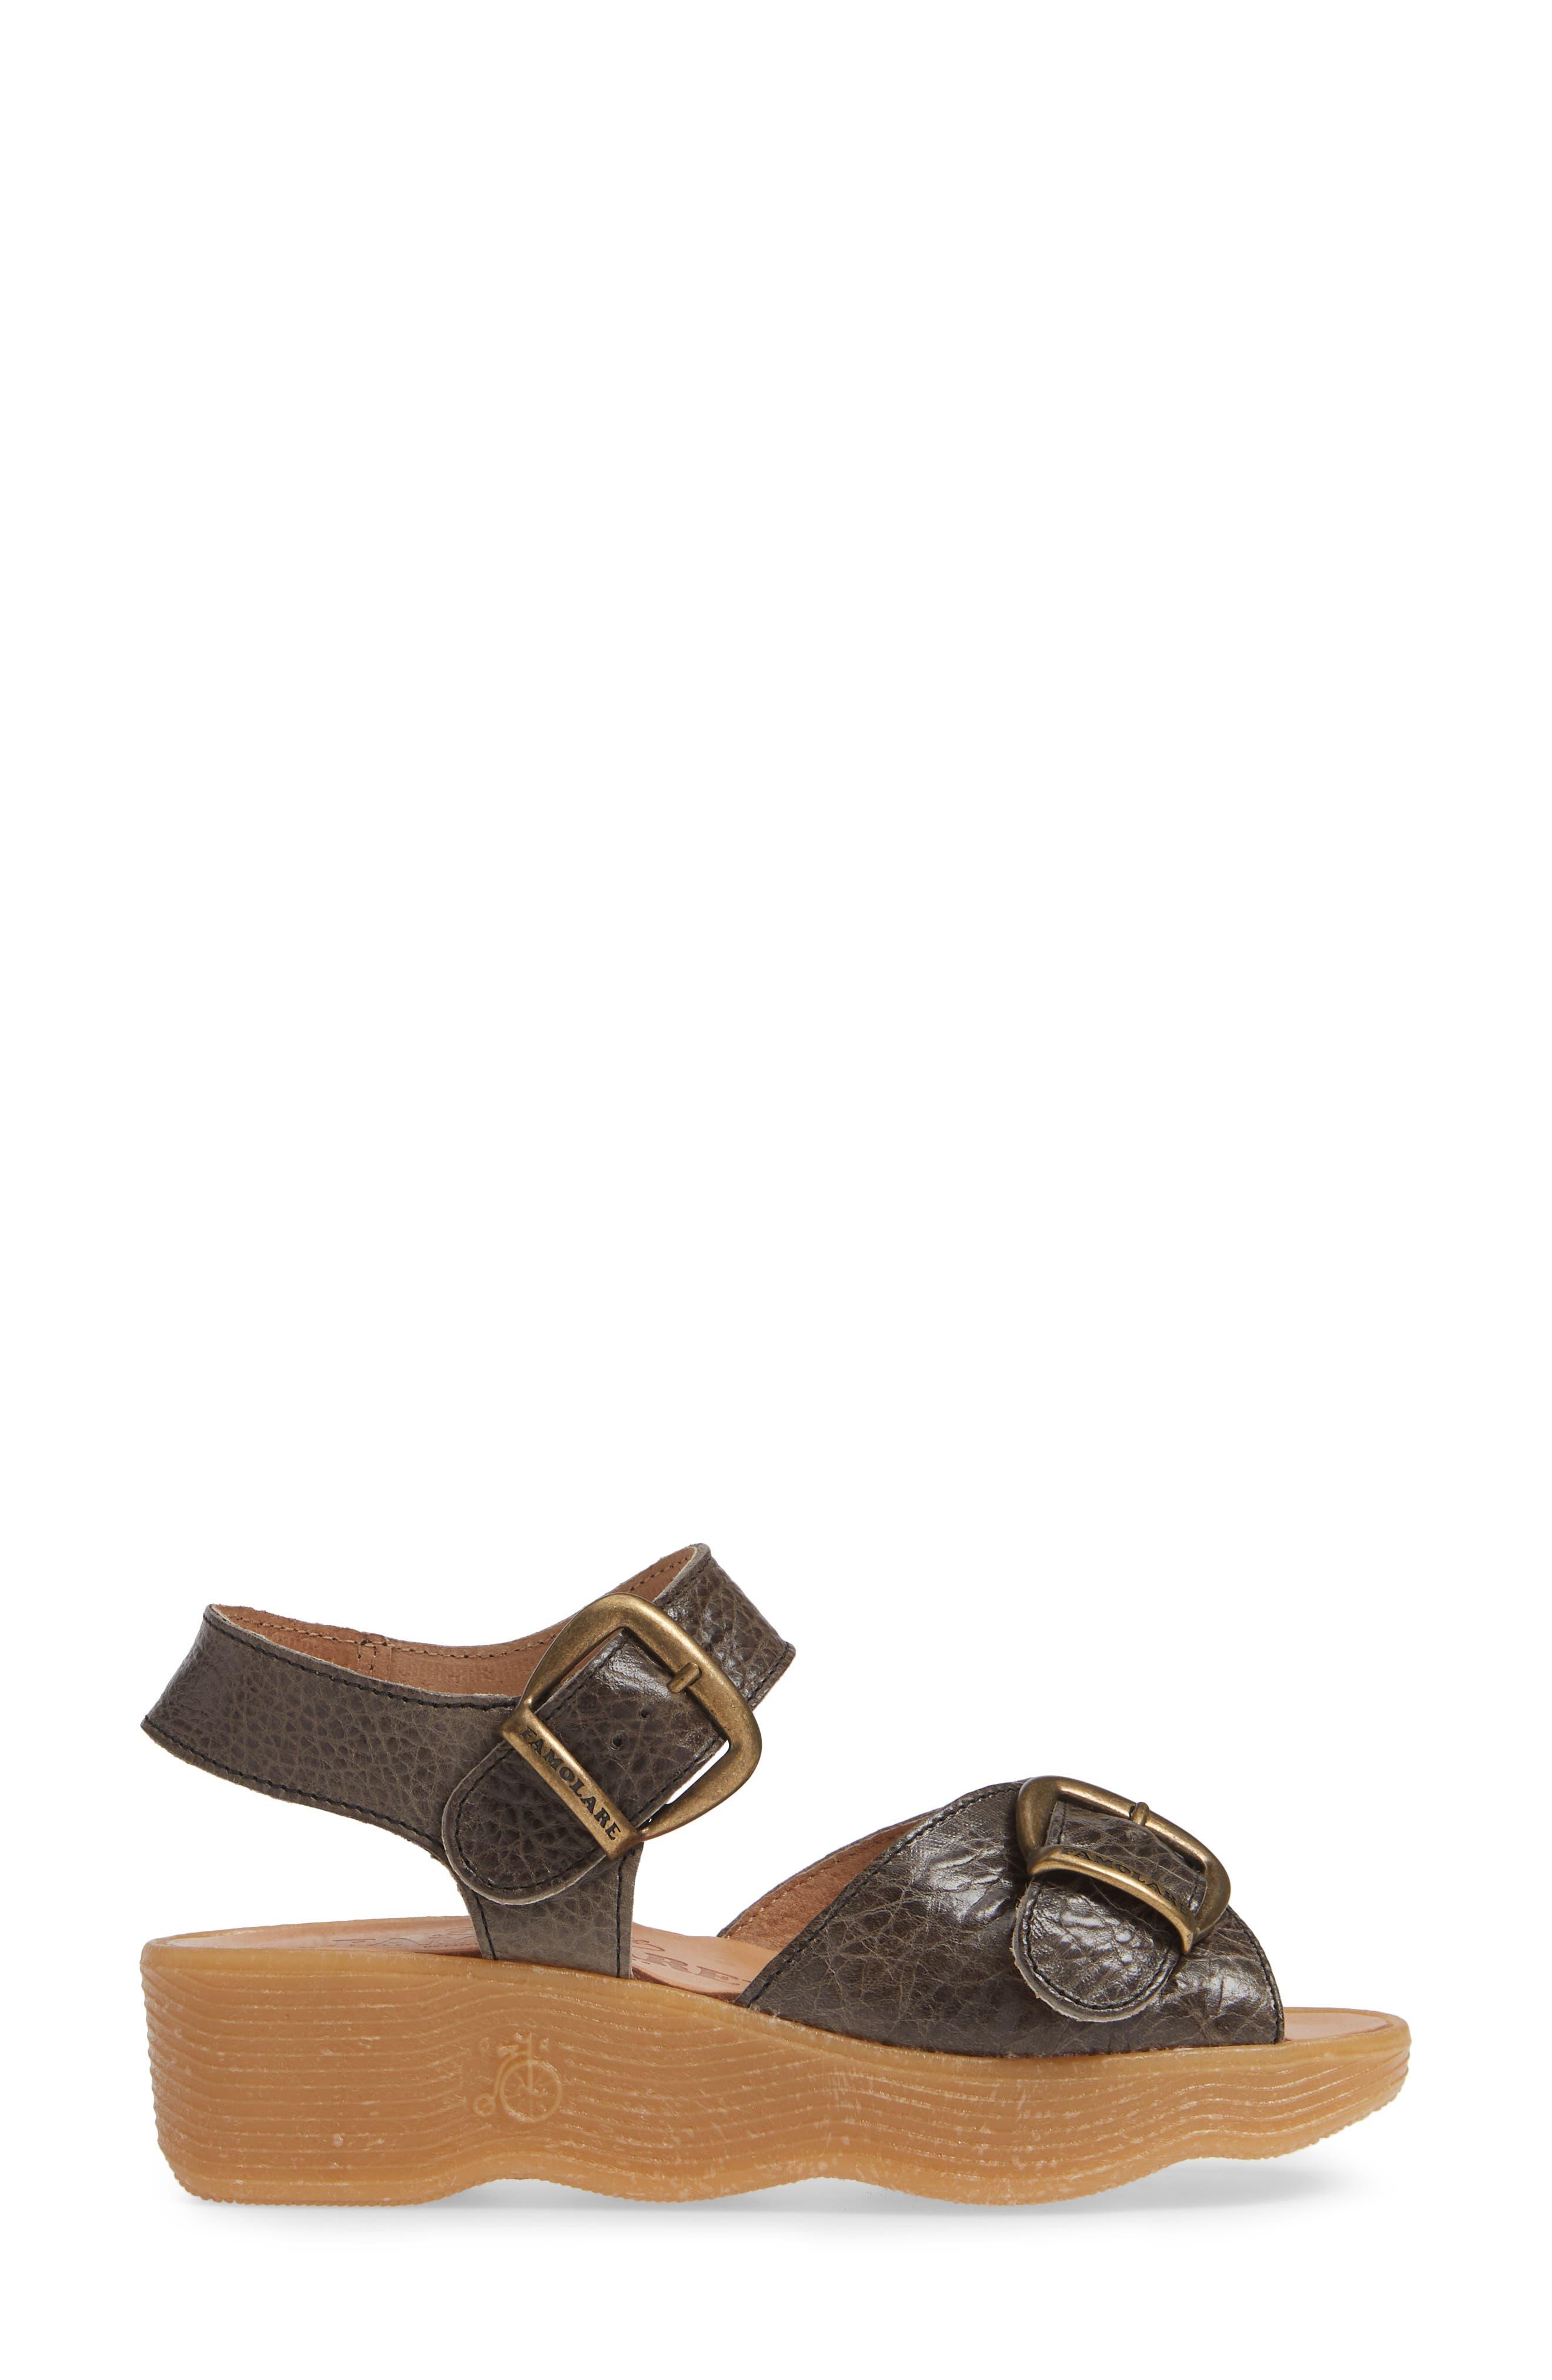 FAMOLARE, Double Play Platform Sandal, Alternate thumbnail 3, color, STEEL SUEDE